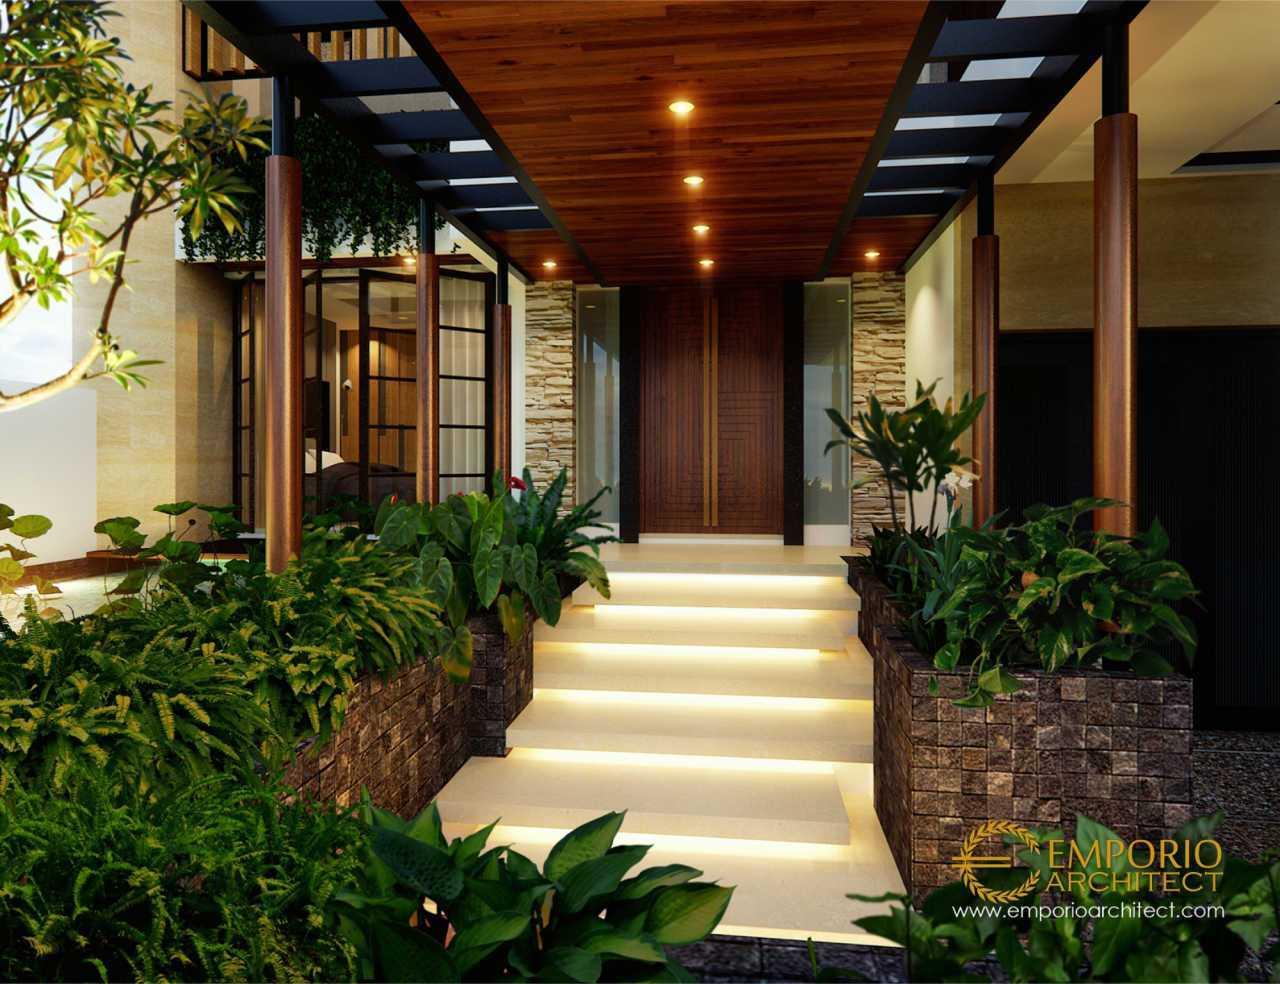 Emporio Architect Jasa Arsitek Bandung Desain Rumah Modern 2 Lantai 373 @ Bandung Bandung, Kota Bandung, Jawa Barat, Indonesia Bandung, Kota Bandung, Jawa Barat, Indonesia Emporio-Architect-Jasa-Arsitek-Bandung-Desain-Rumah-Modern-2-Lantai-373-Bandung  90942